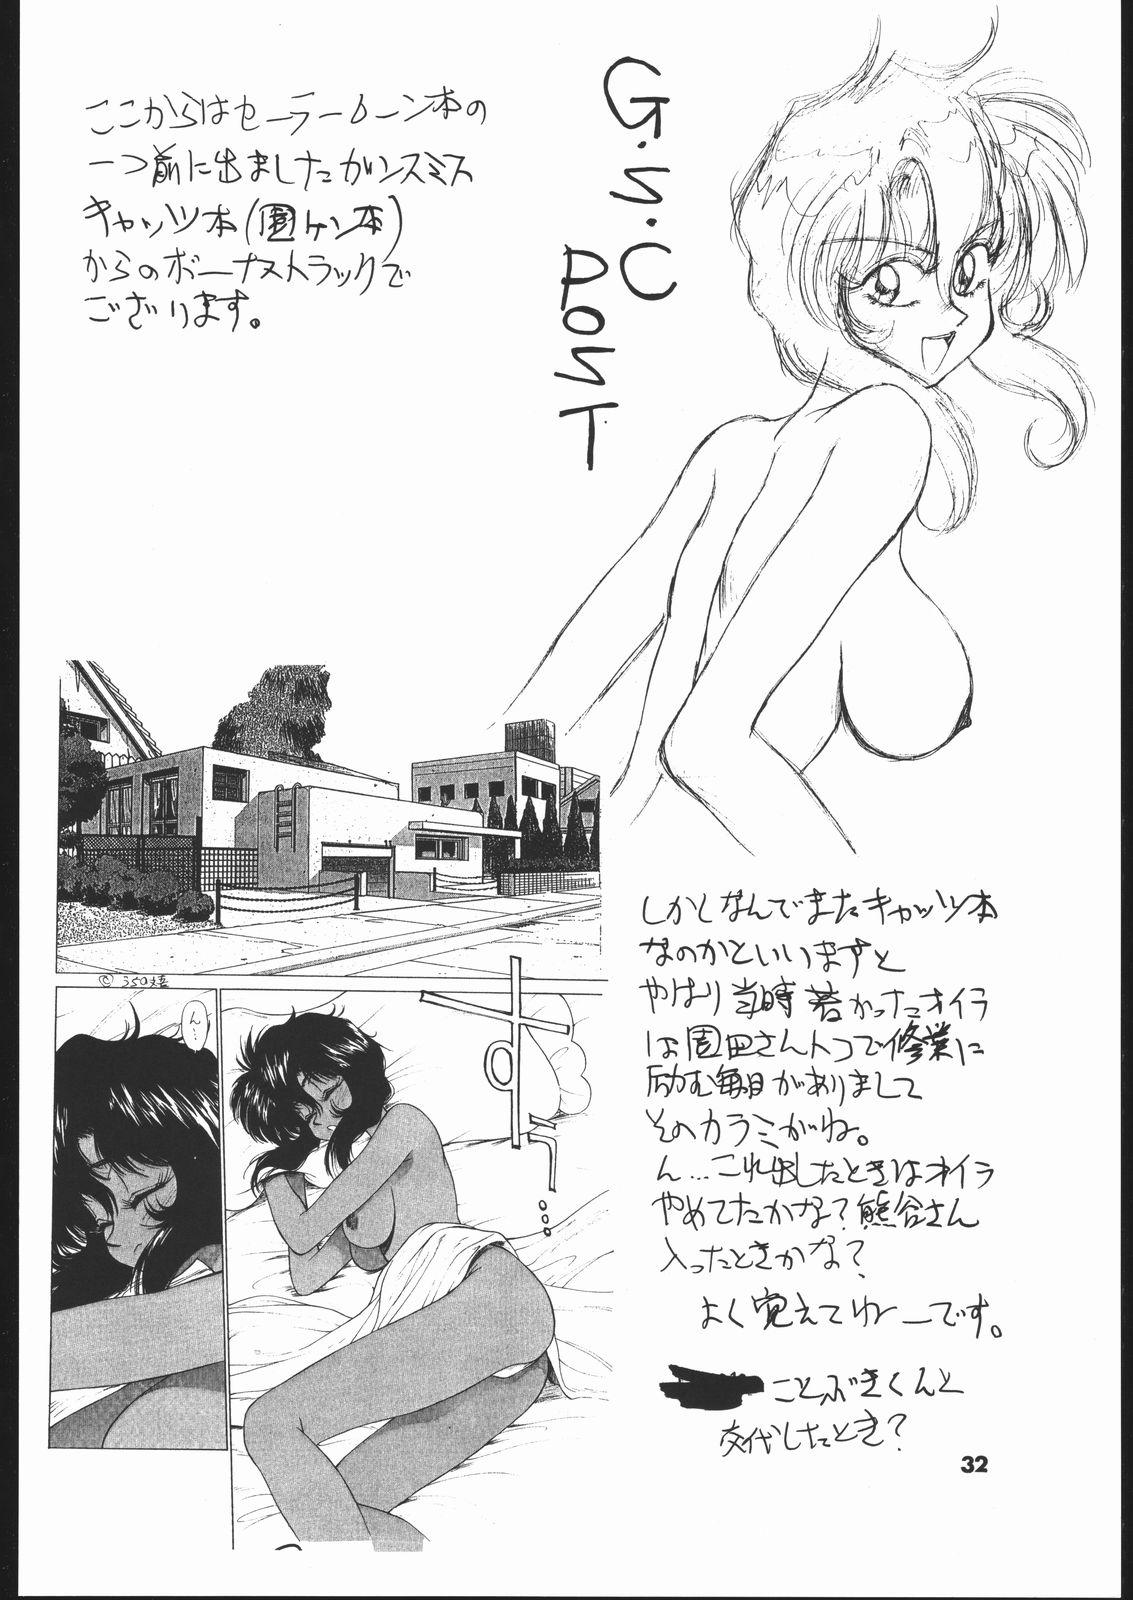 kakutou geemu hon 32